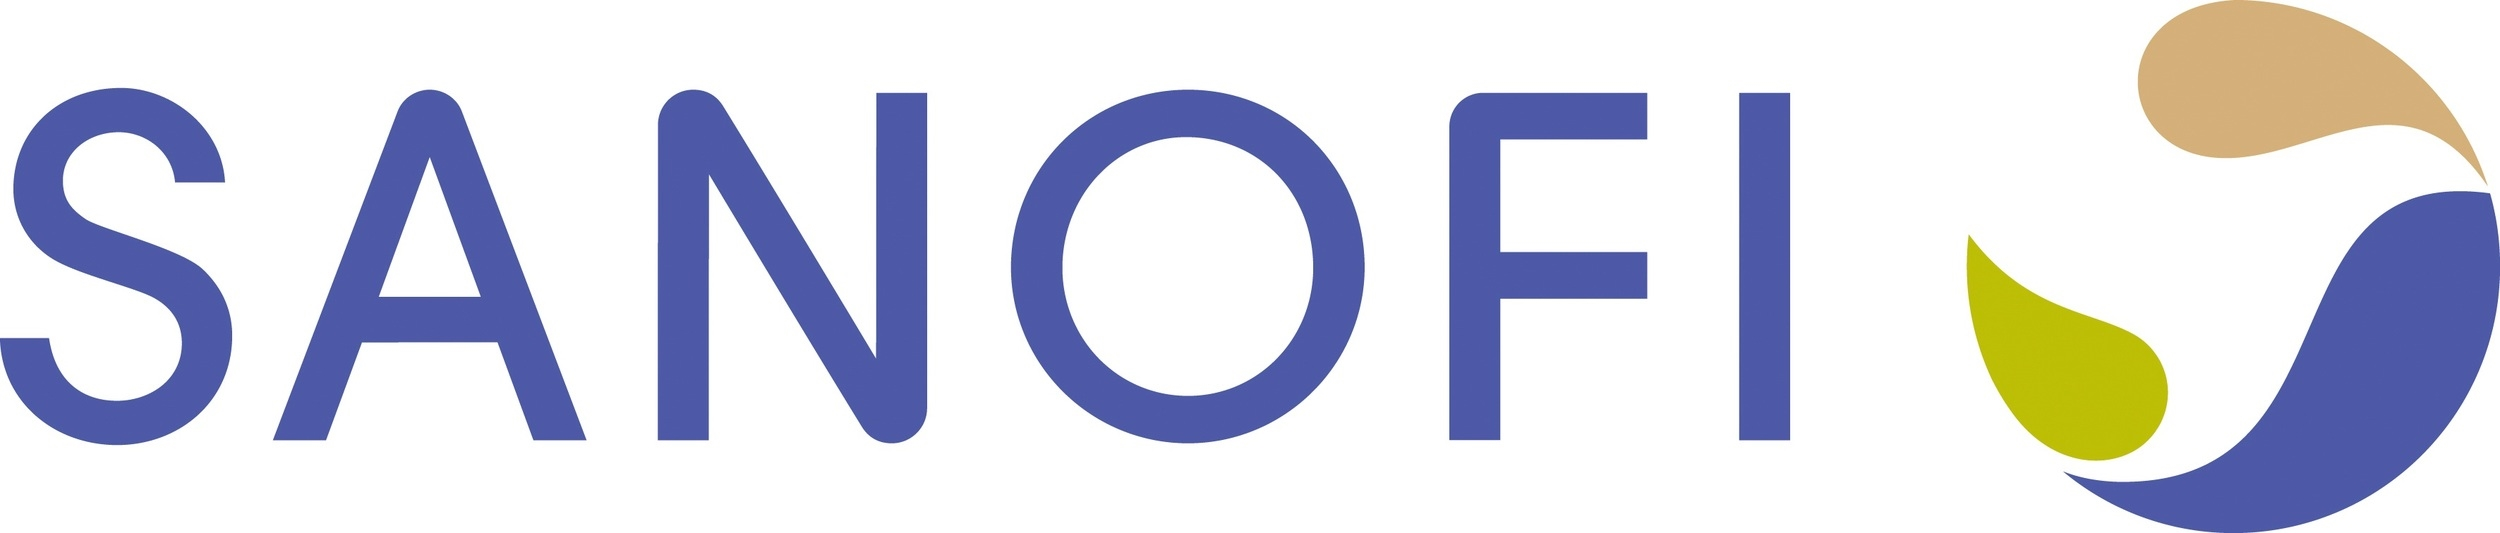 logo-Sanofi.jpg